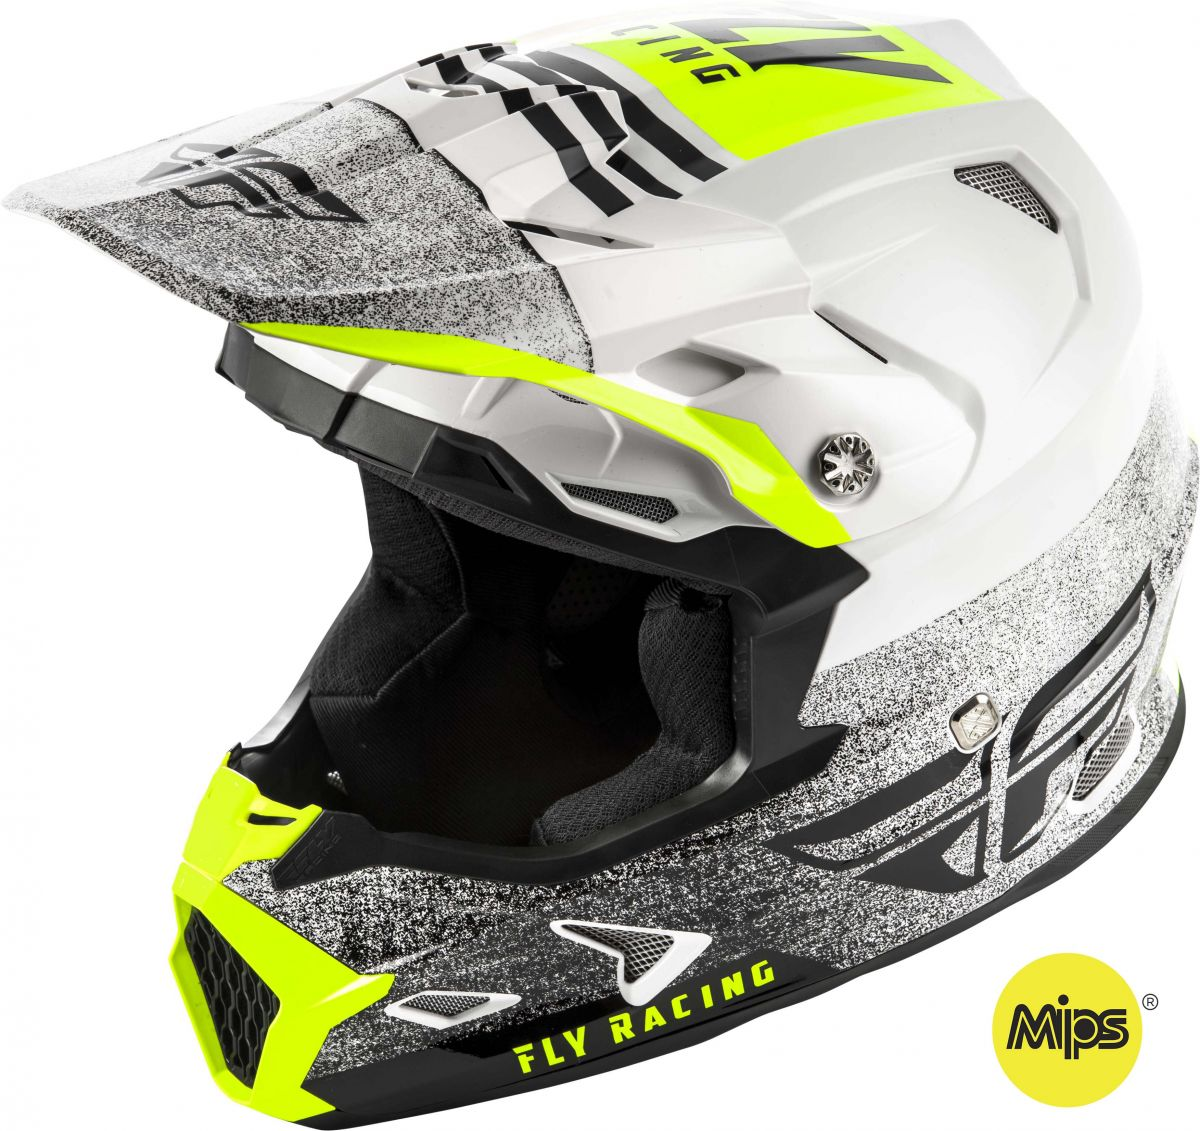 Fly - 2019 Toxin MIPS Embargo White/Black шлем, бело-черный